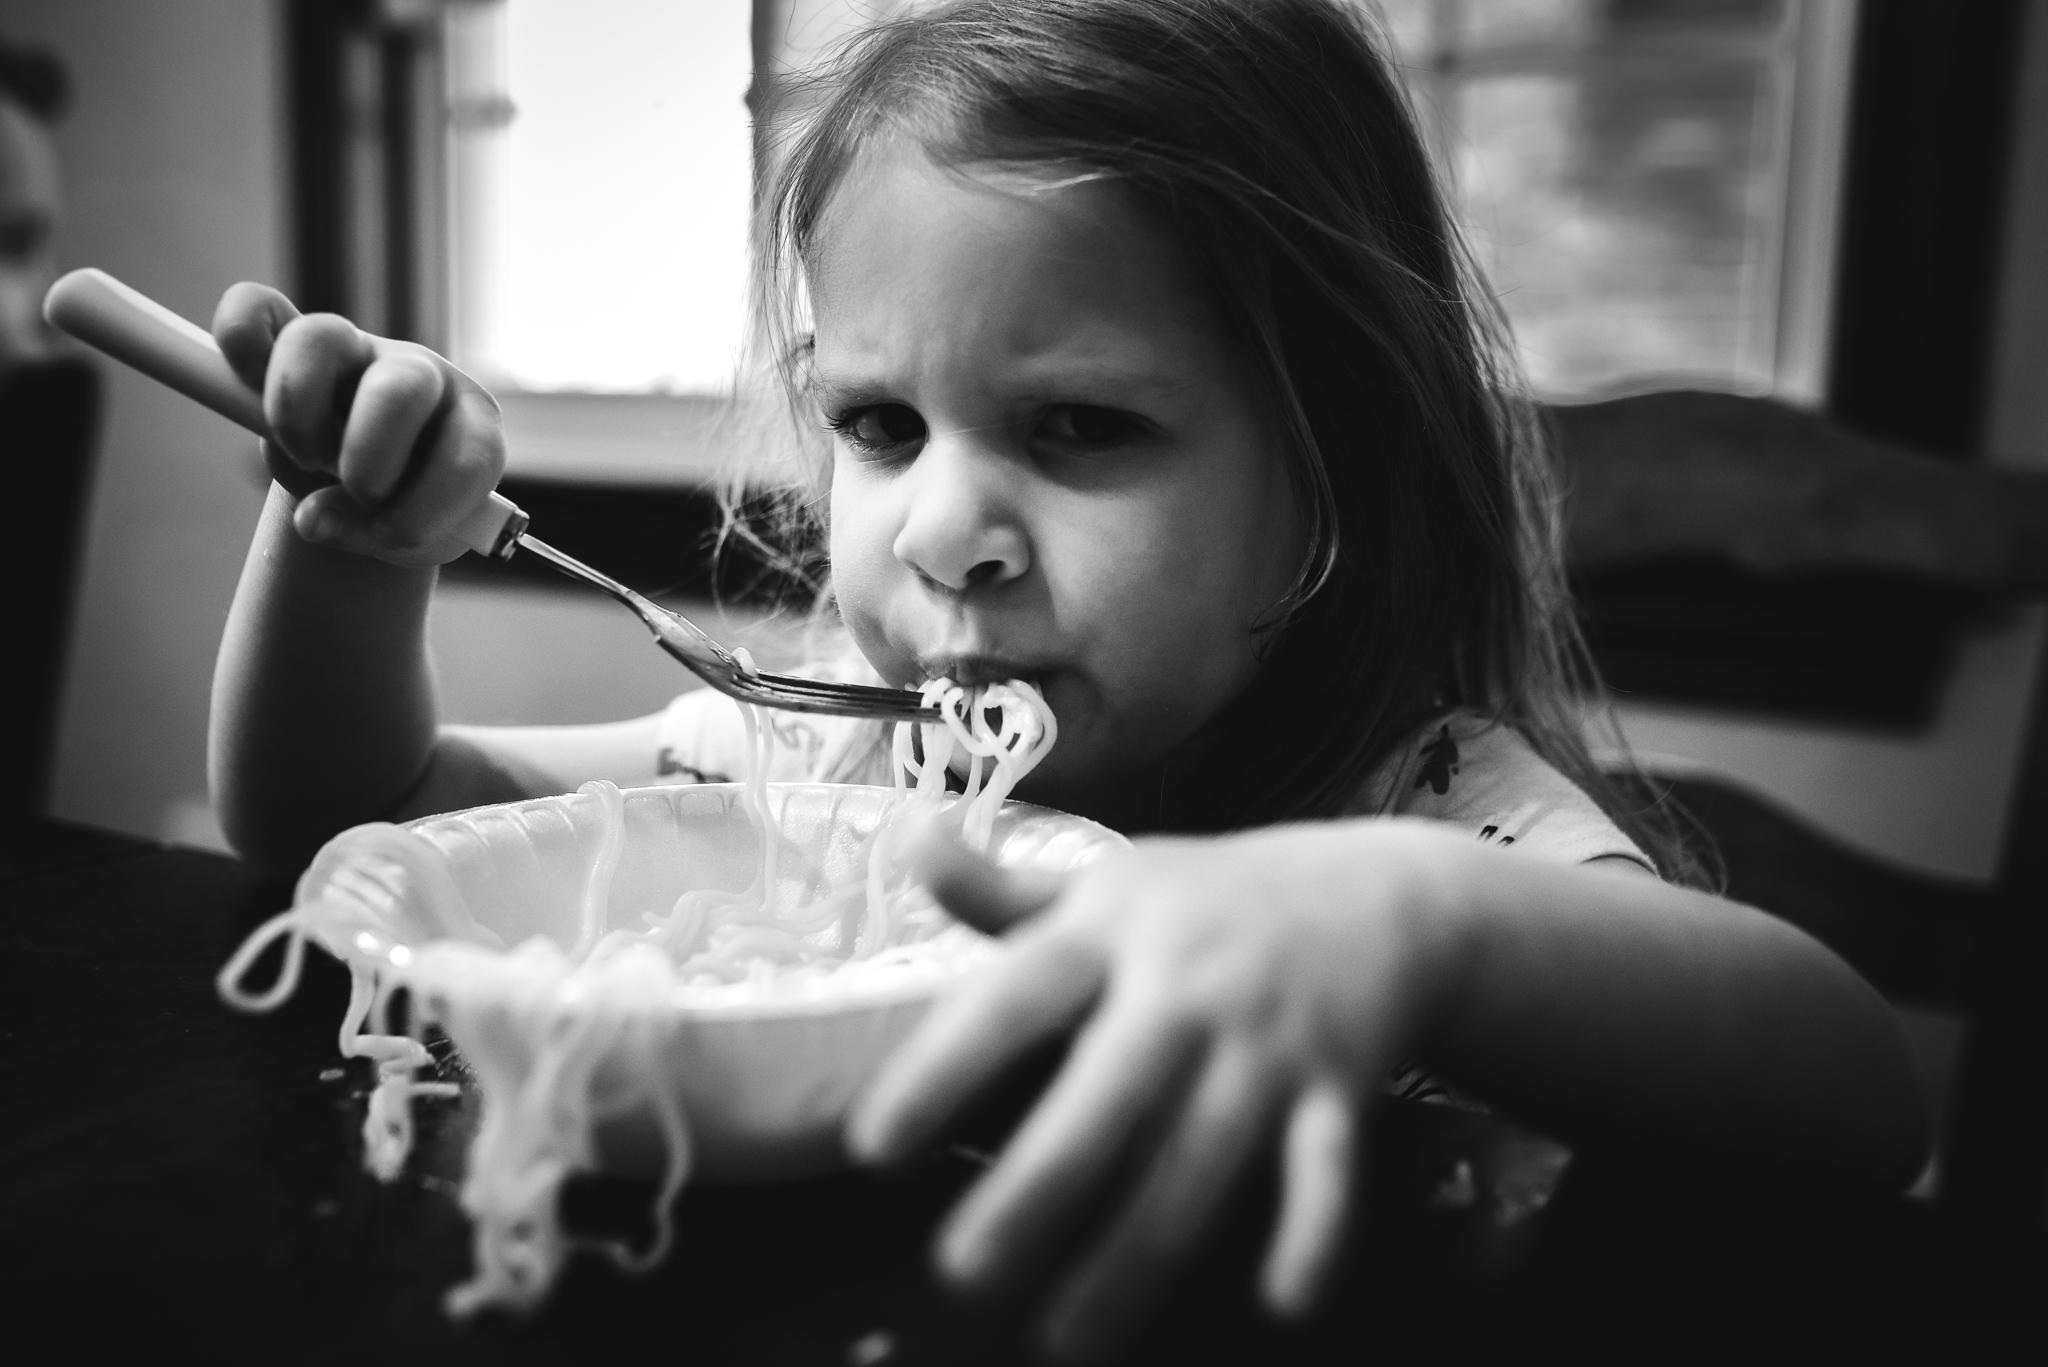 kid eating ramen noodles